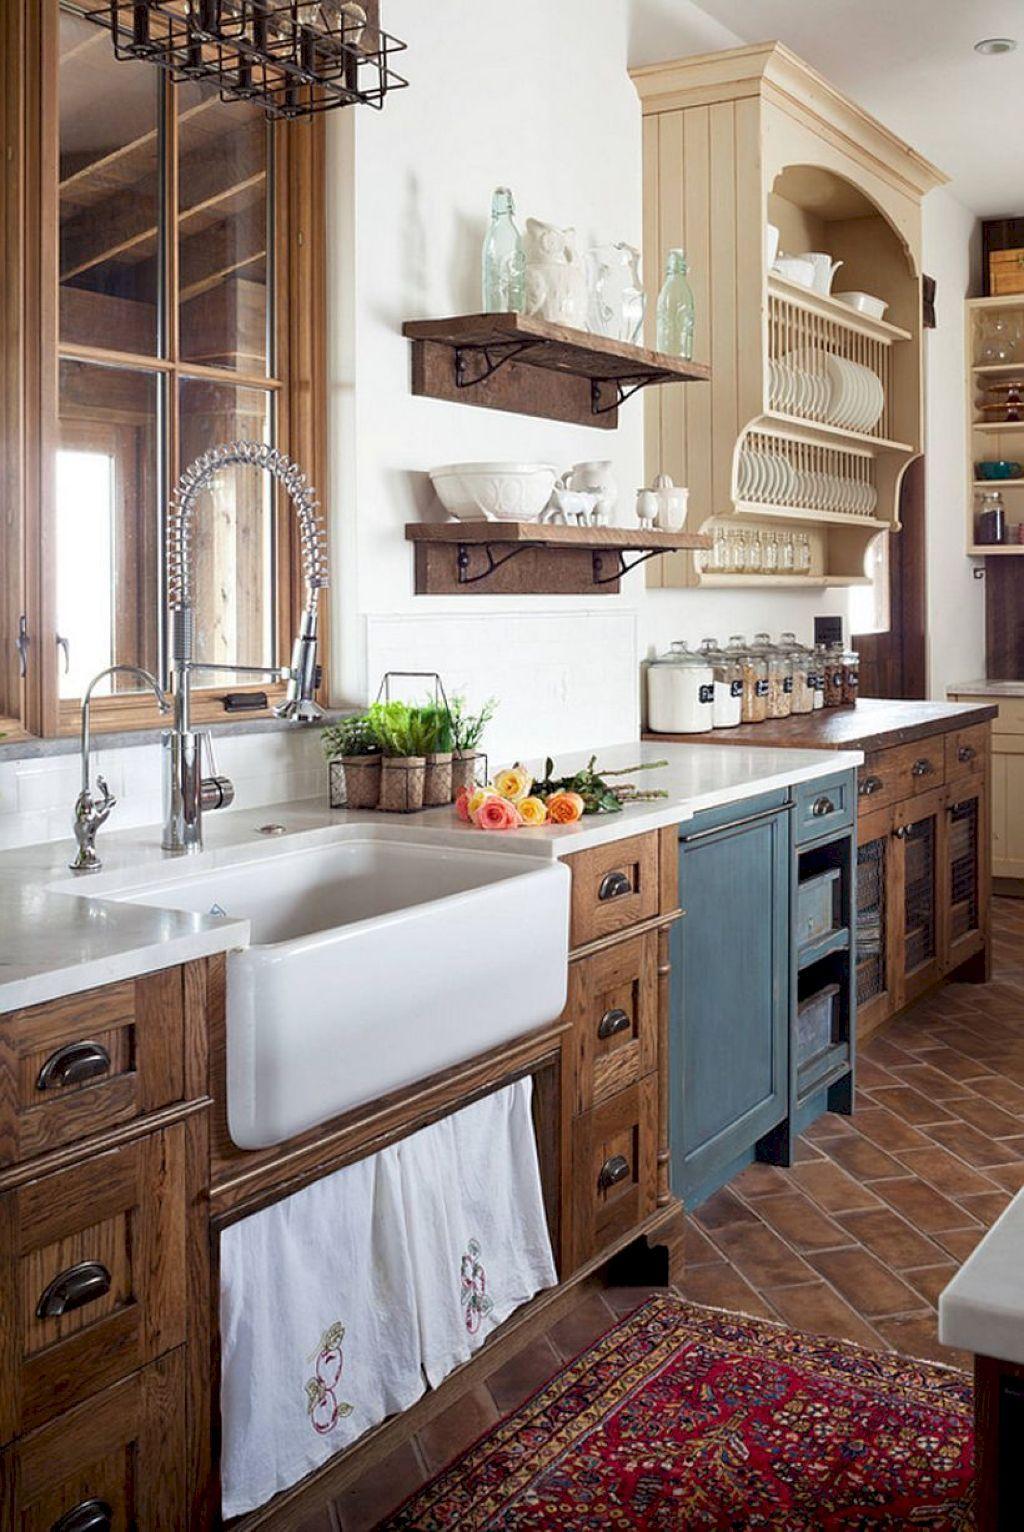 12 Best Rustic Farmhouse Kitchen Cabinets Ideas 12 Best Rustic